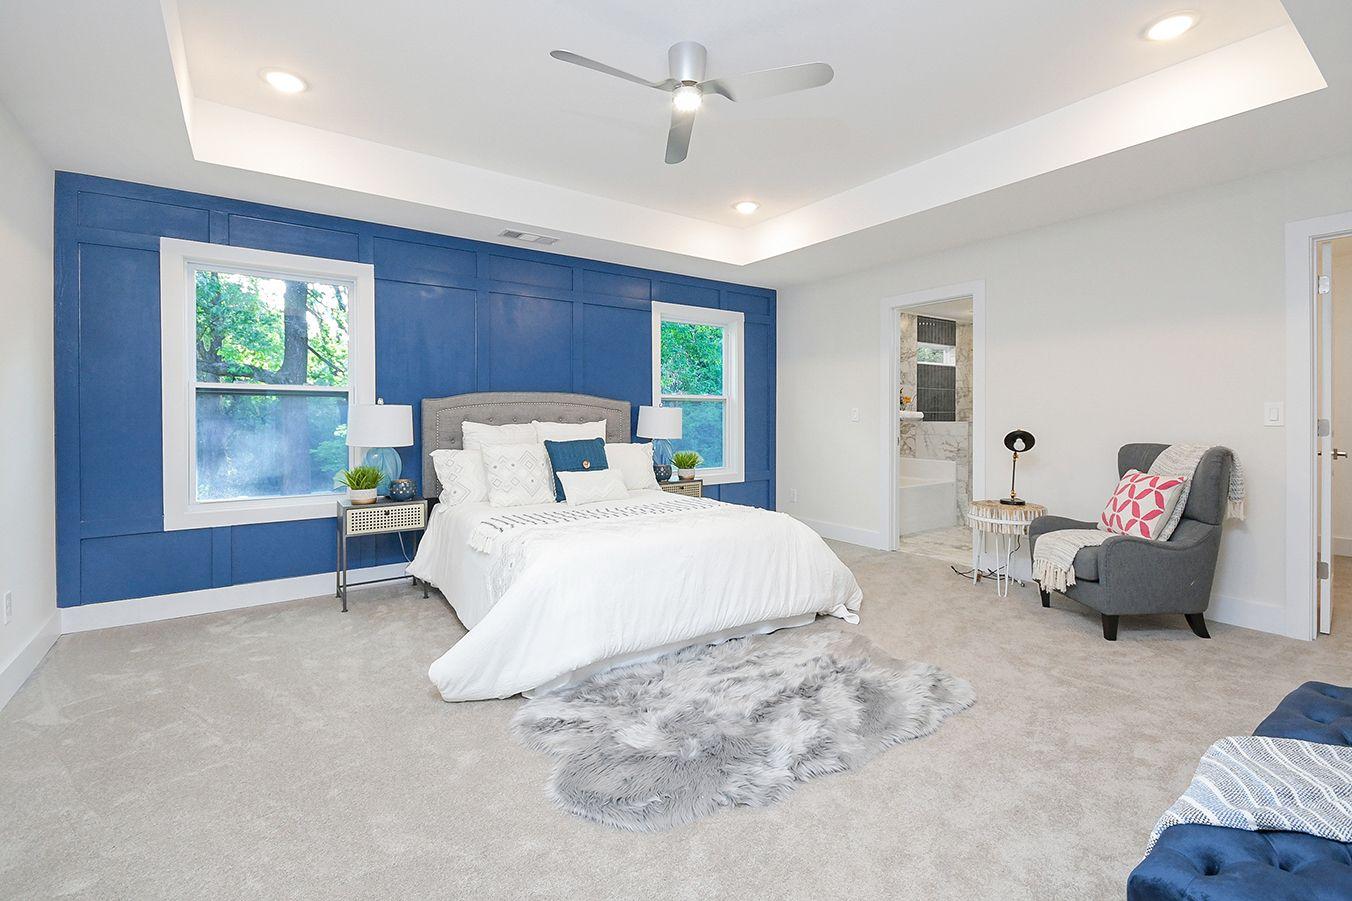 Upper_Level_Master_Bedroom_view1 (5).jpg